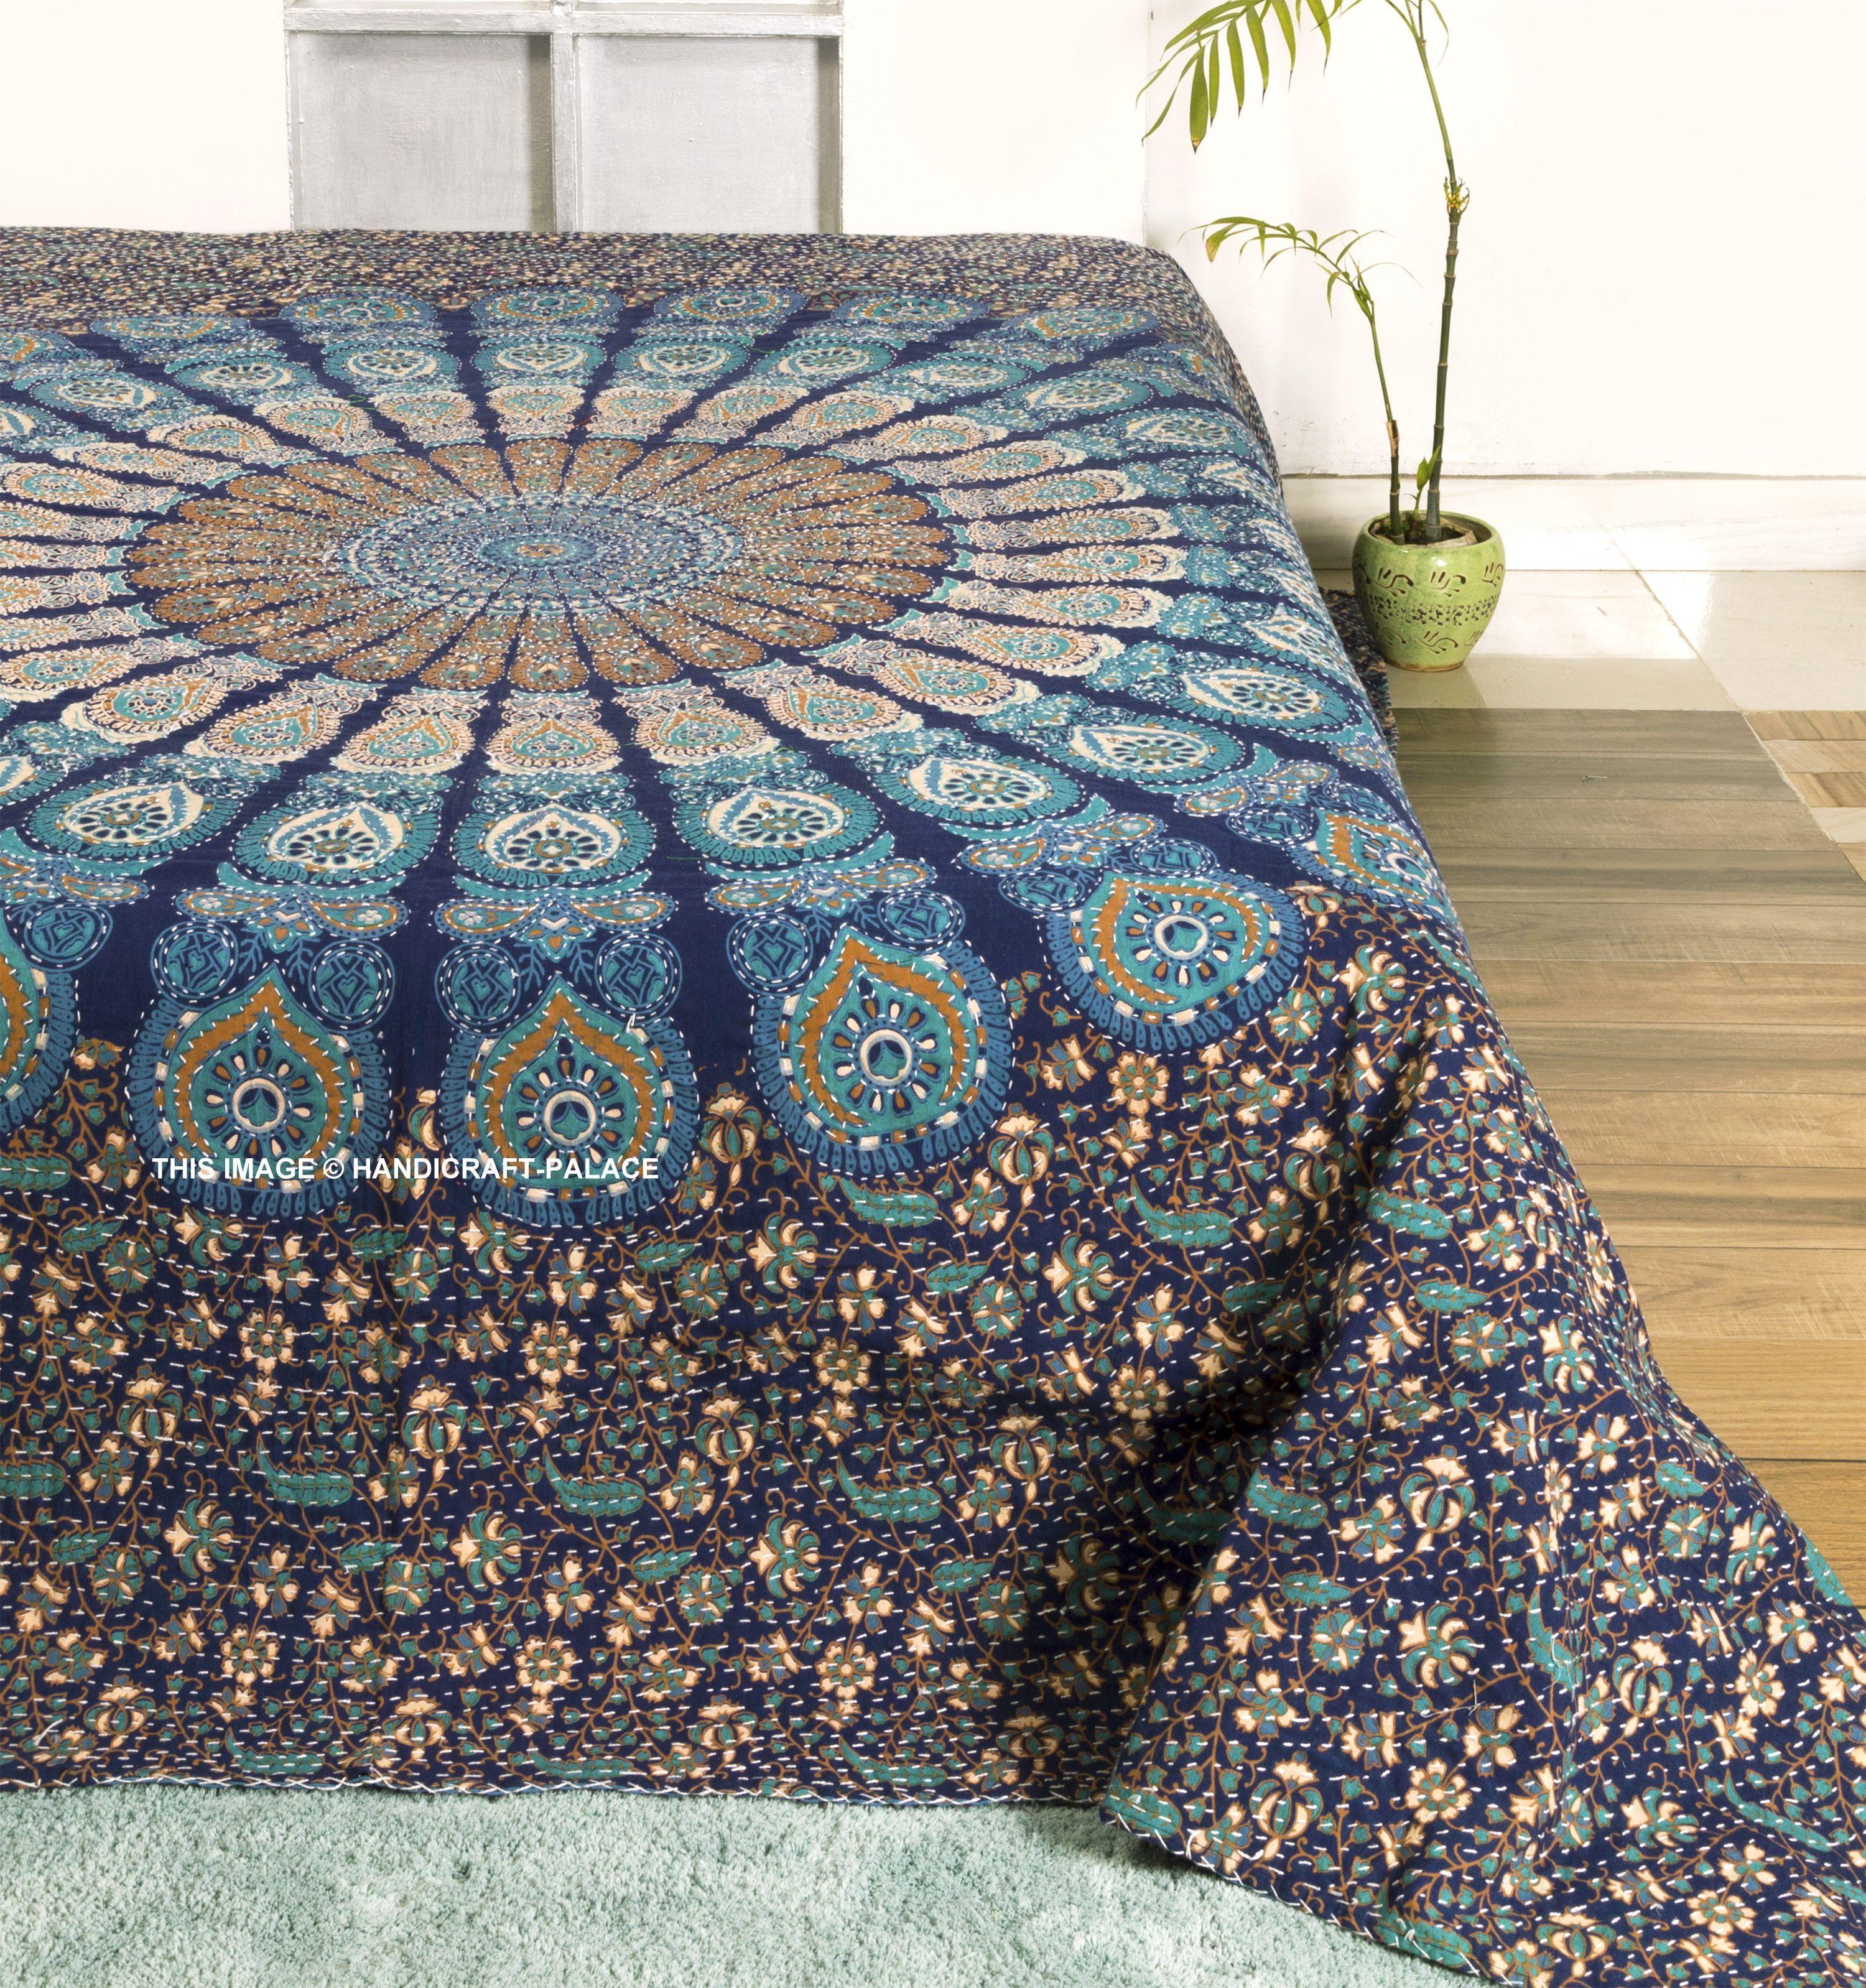 Artisan Hand-Stitched Handmade Kantha Quilt Floral Print Tie dye Queen Size Quilt Indian Handmade Bohemian Bedspread Cotton Floral Kantha